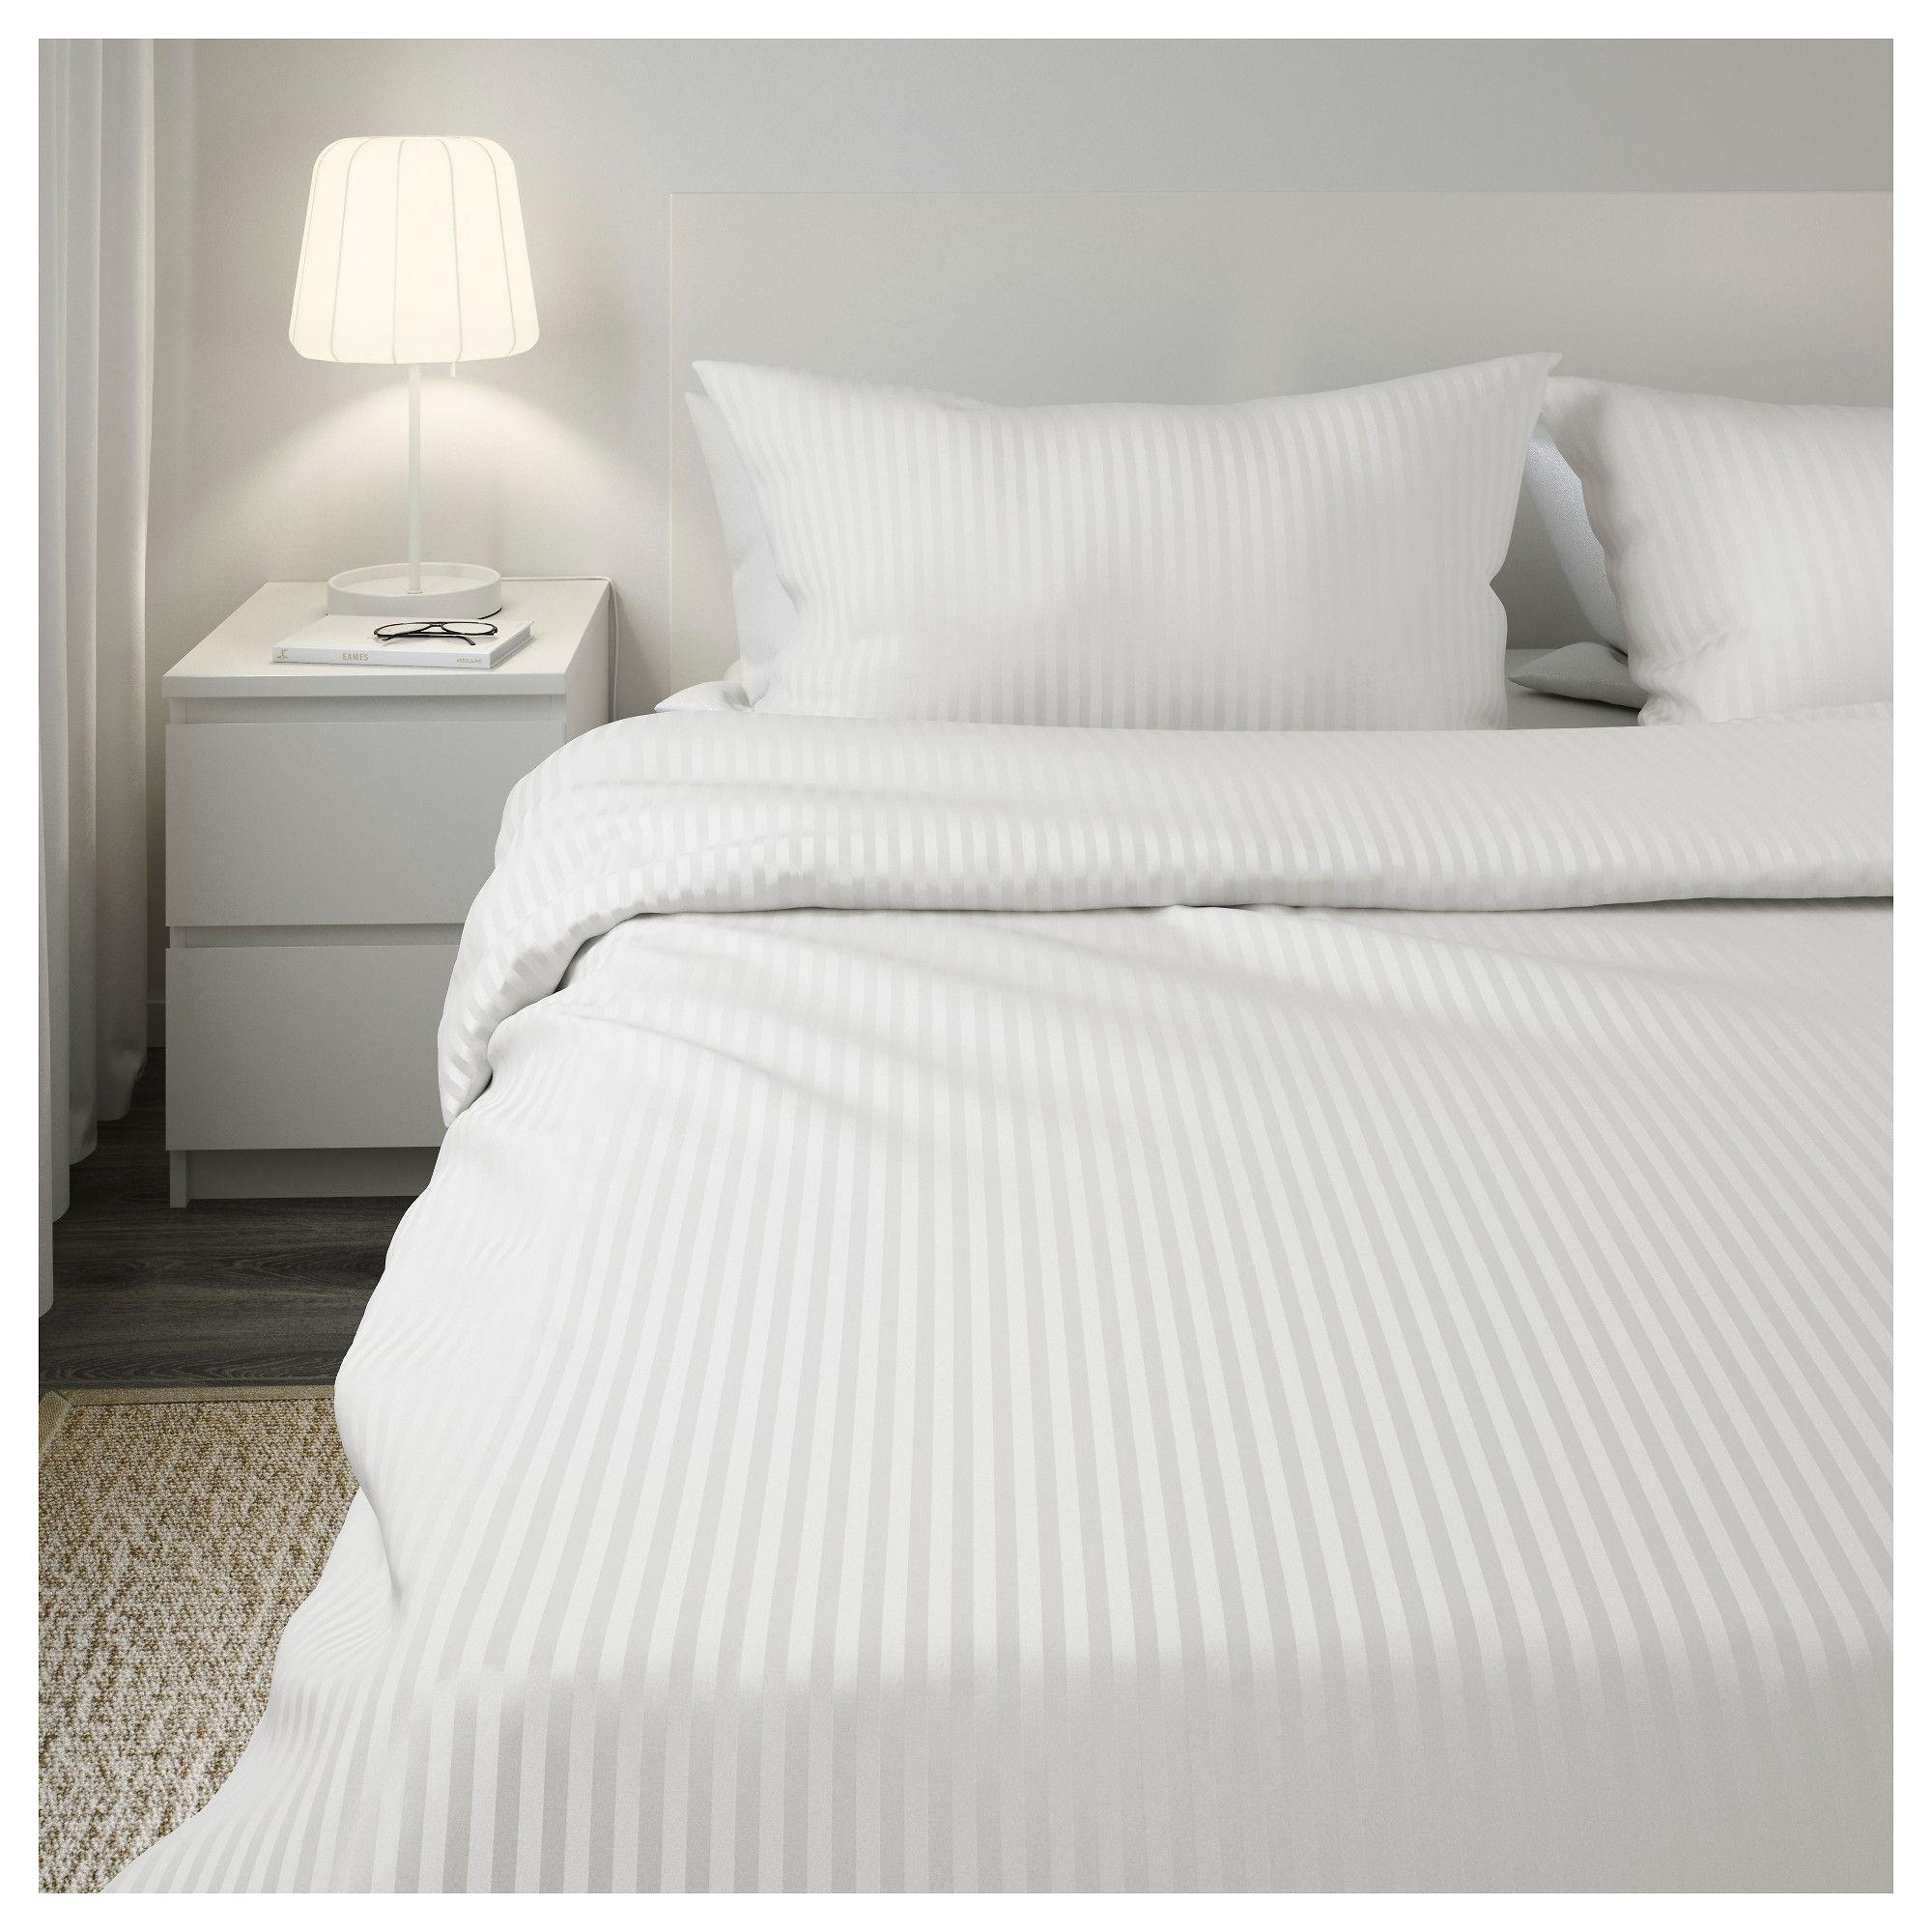 Nattjasmin Duvet Cover And Pillowcase S White Twin Duvet